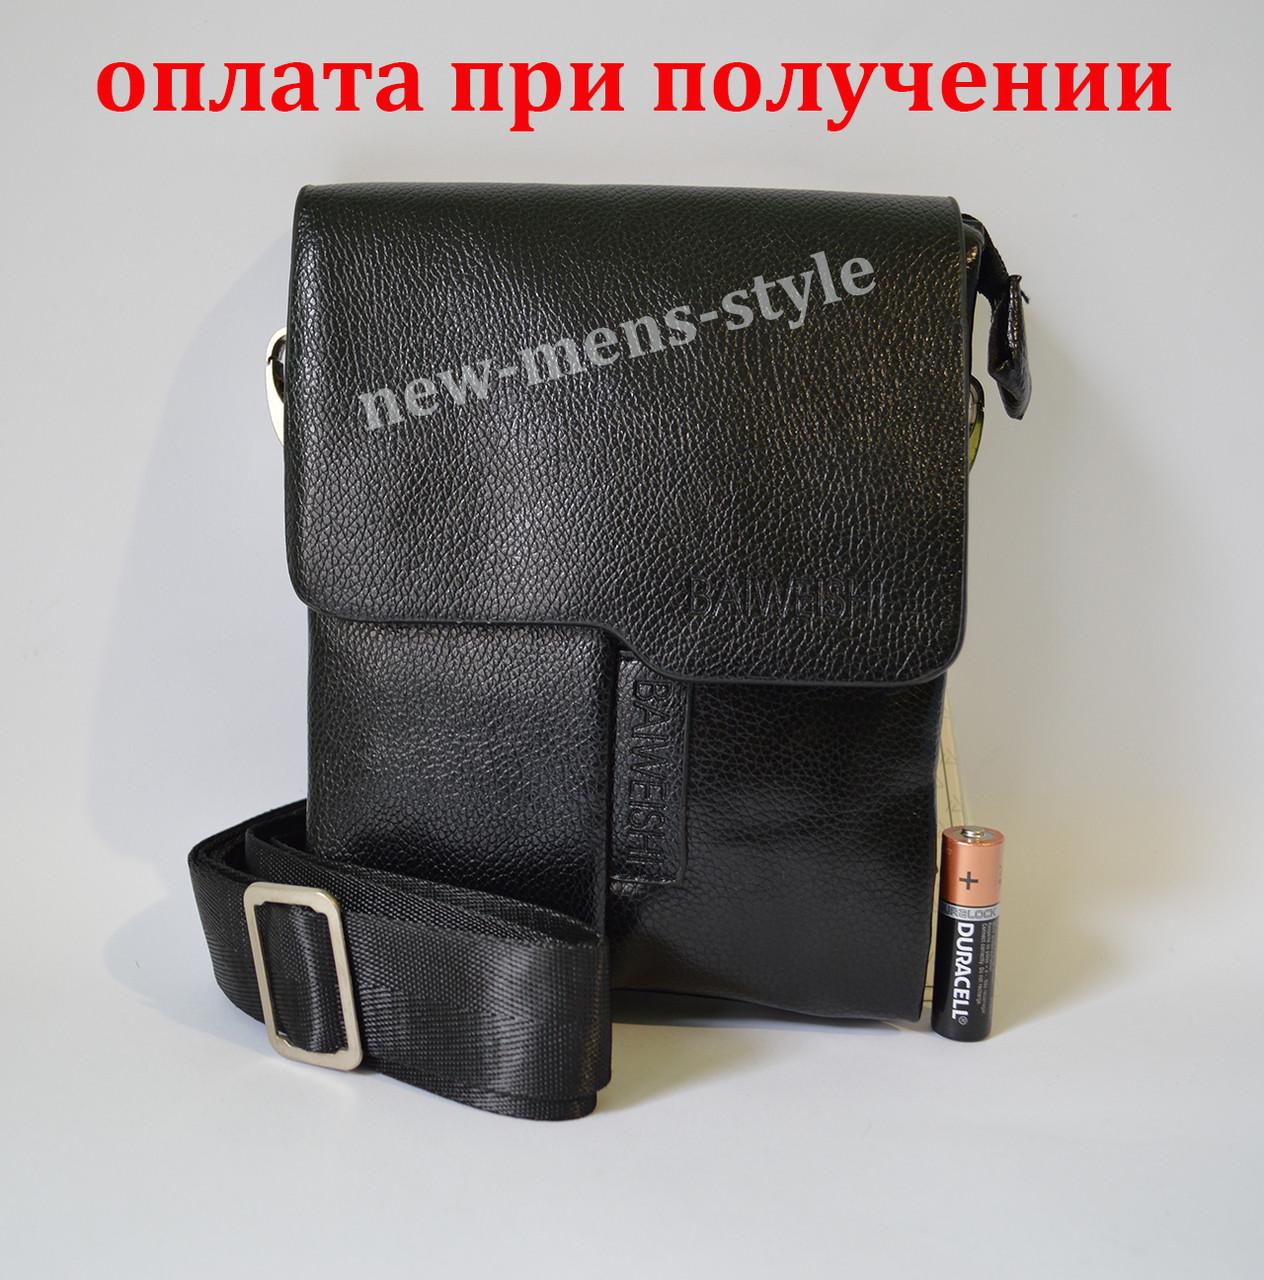 14c5cc36f8f4 Мужская кожаная фирменная сумка барсетка BAIWEISHI Polo купить шкіряна